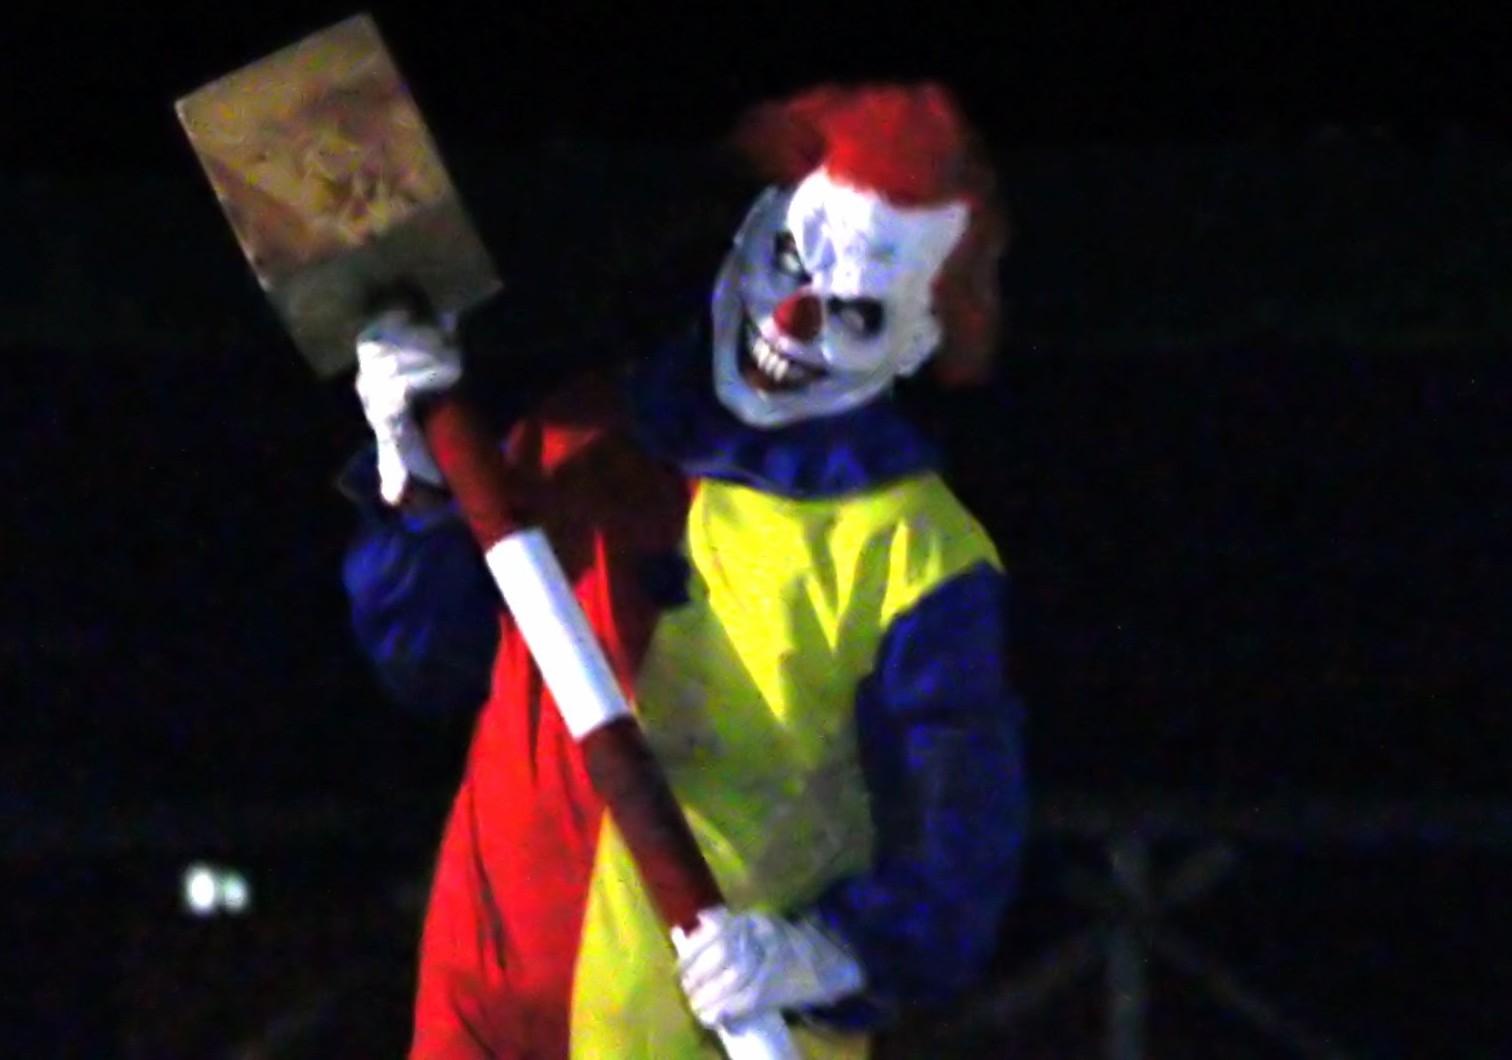 Killer Clown The Most Scare Prank!